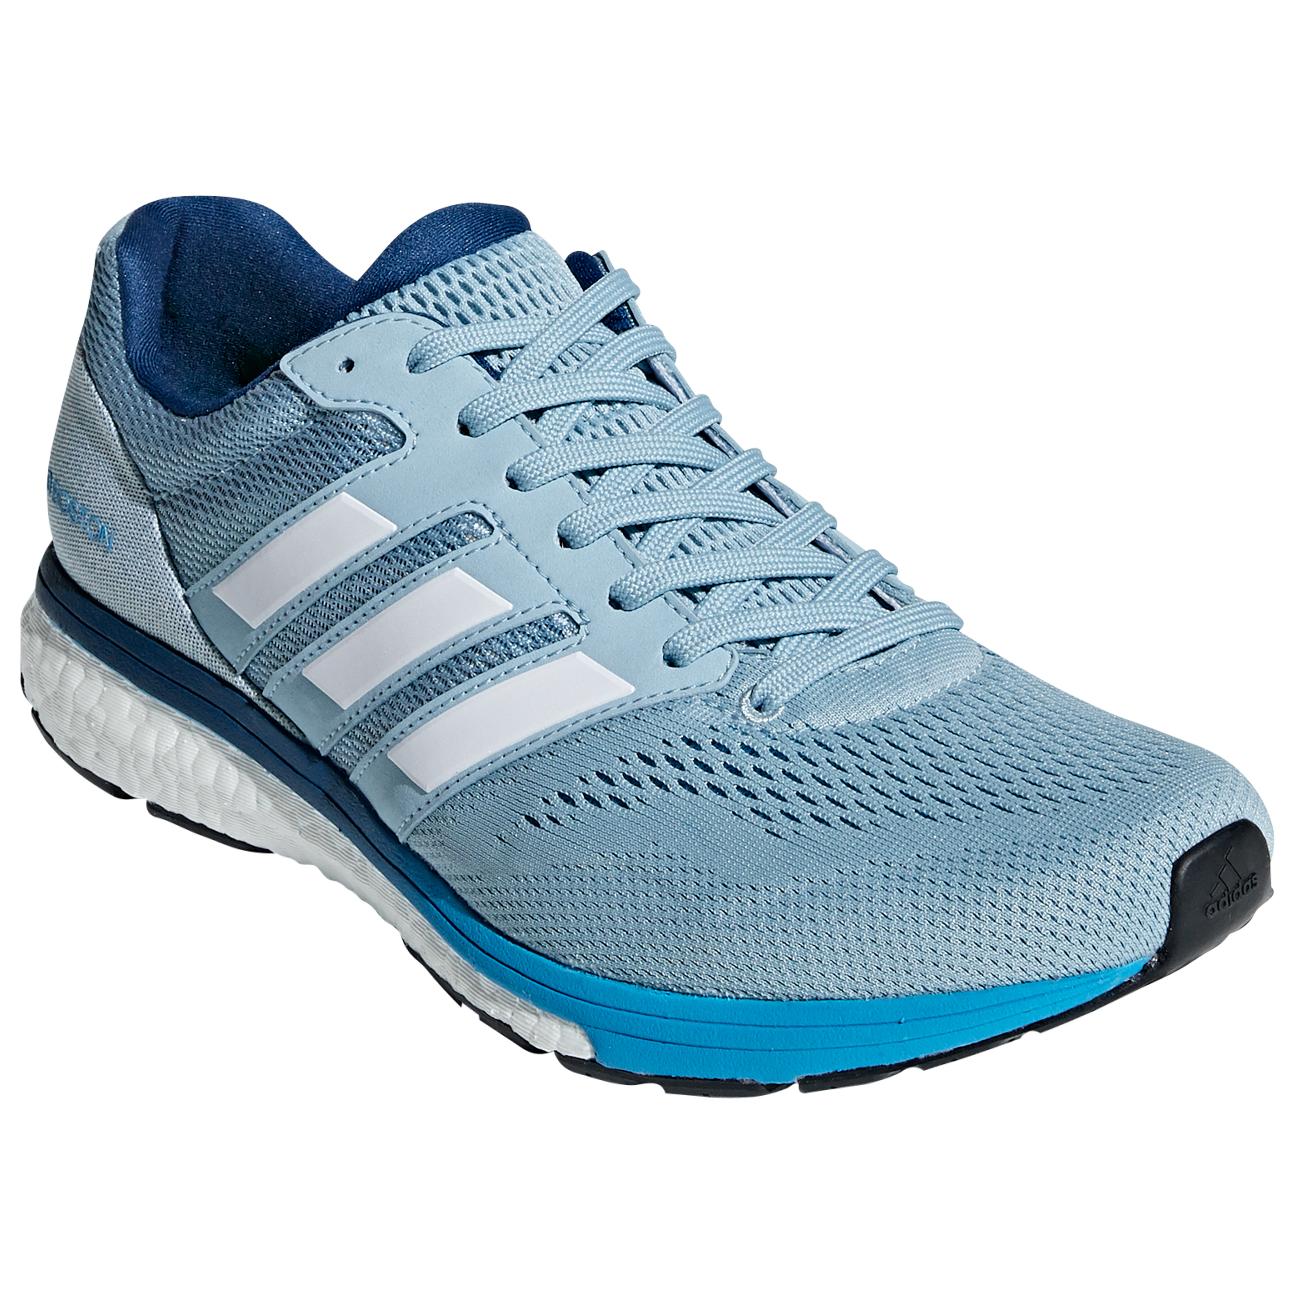 promo code 139c3 cbacf adidas - Adizero Boston 7 - Chaussures de running ...